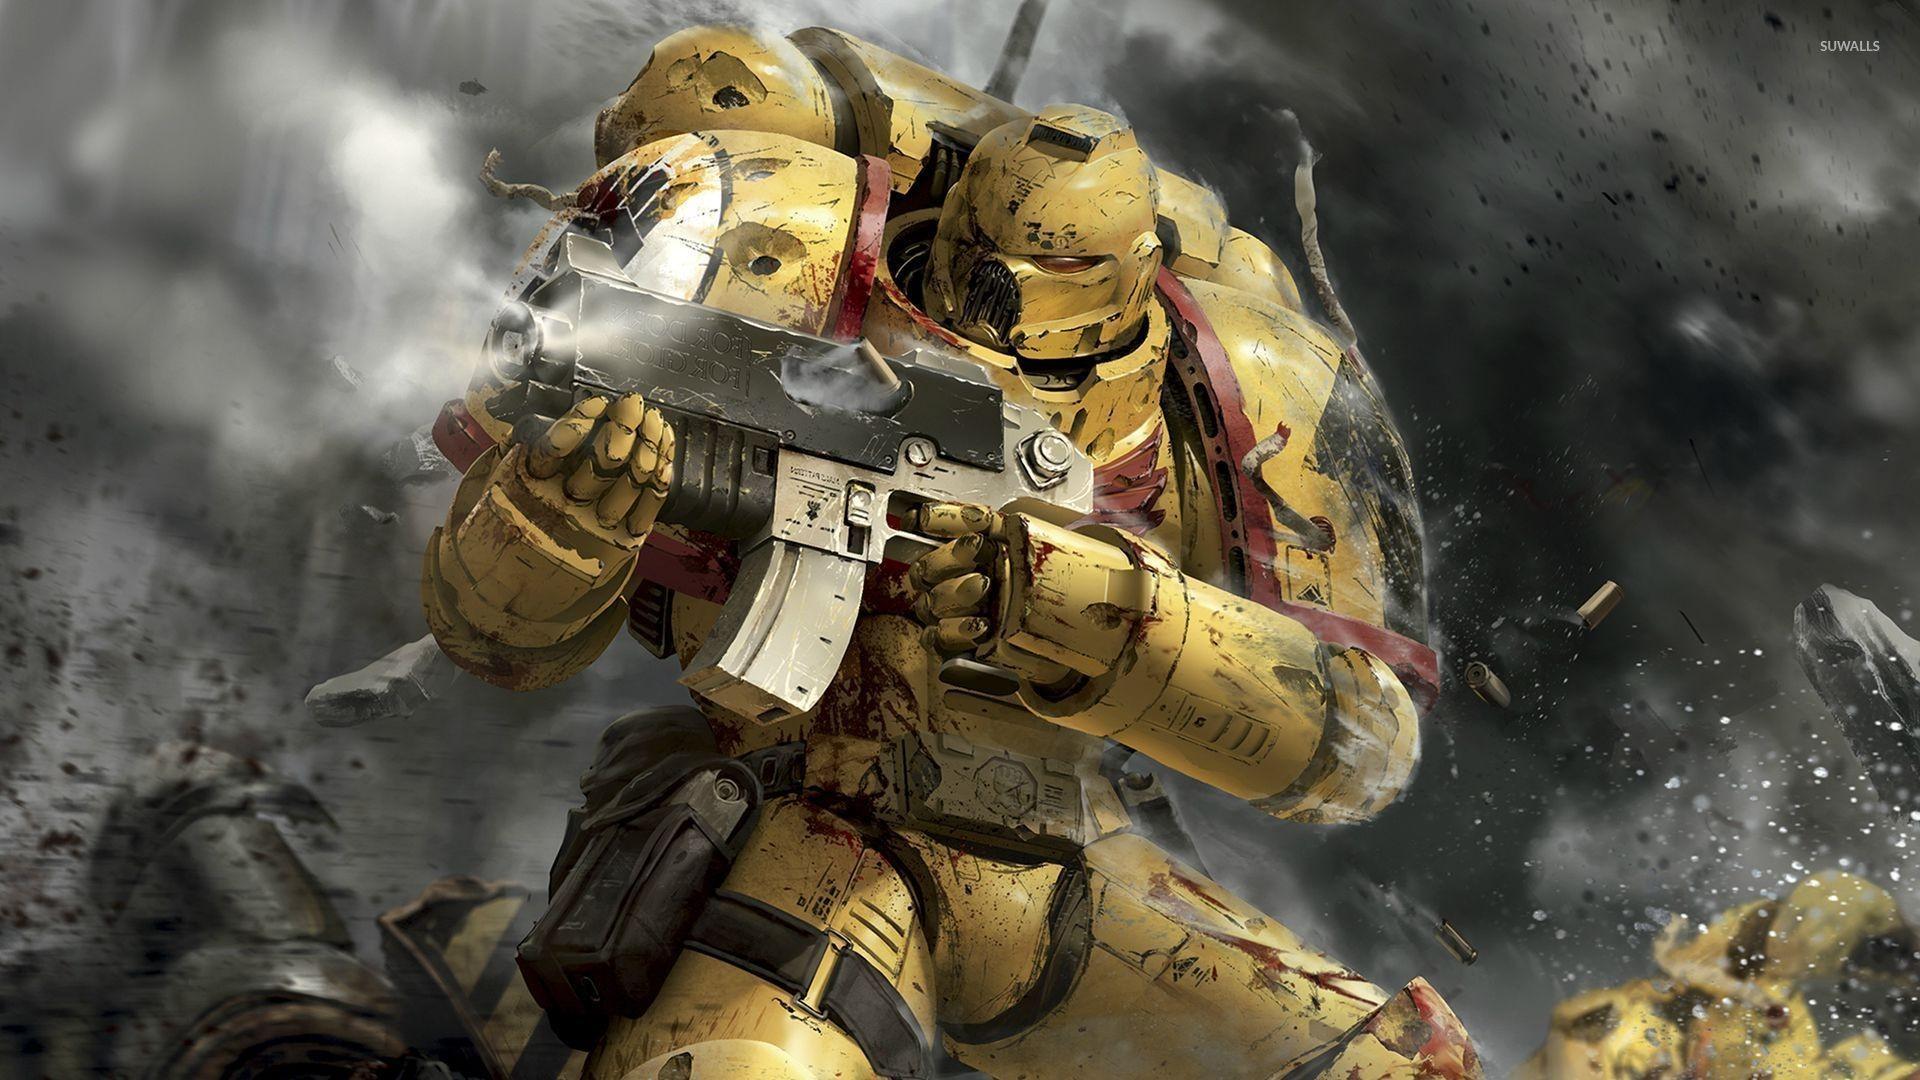 Warhammer 40k Wallpaper 70 Pictures